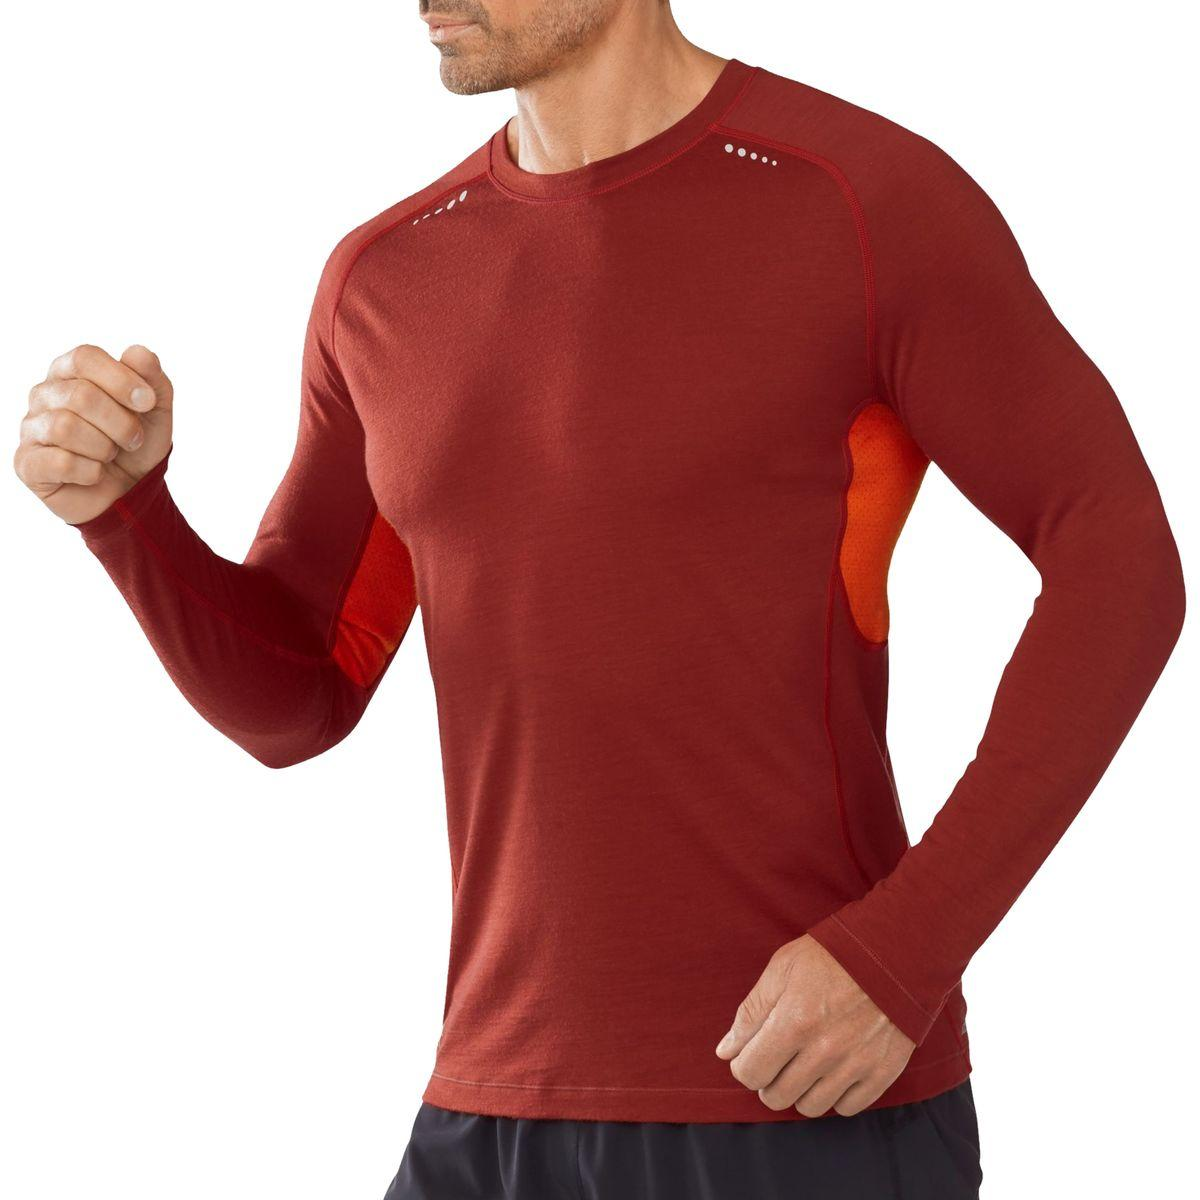 Smartwool Wool Phd Ultra Light Shirt Long Sleeve In Red